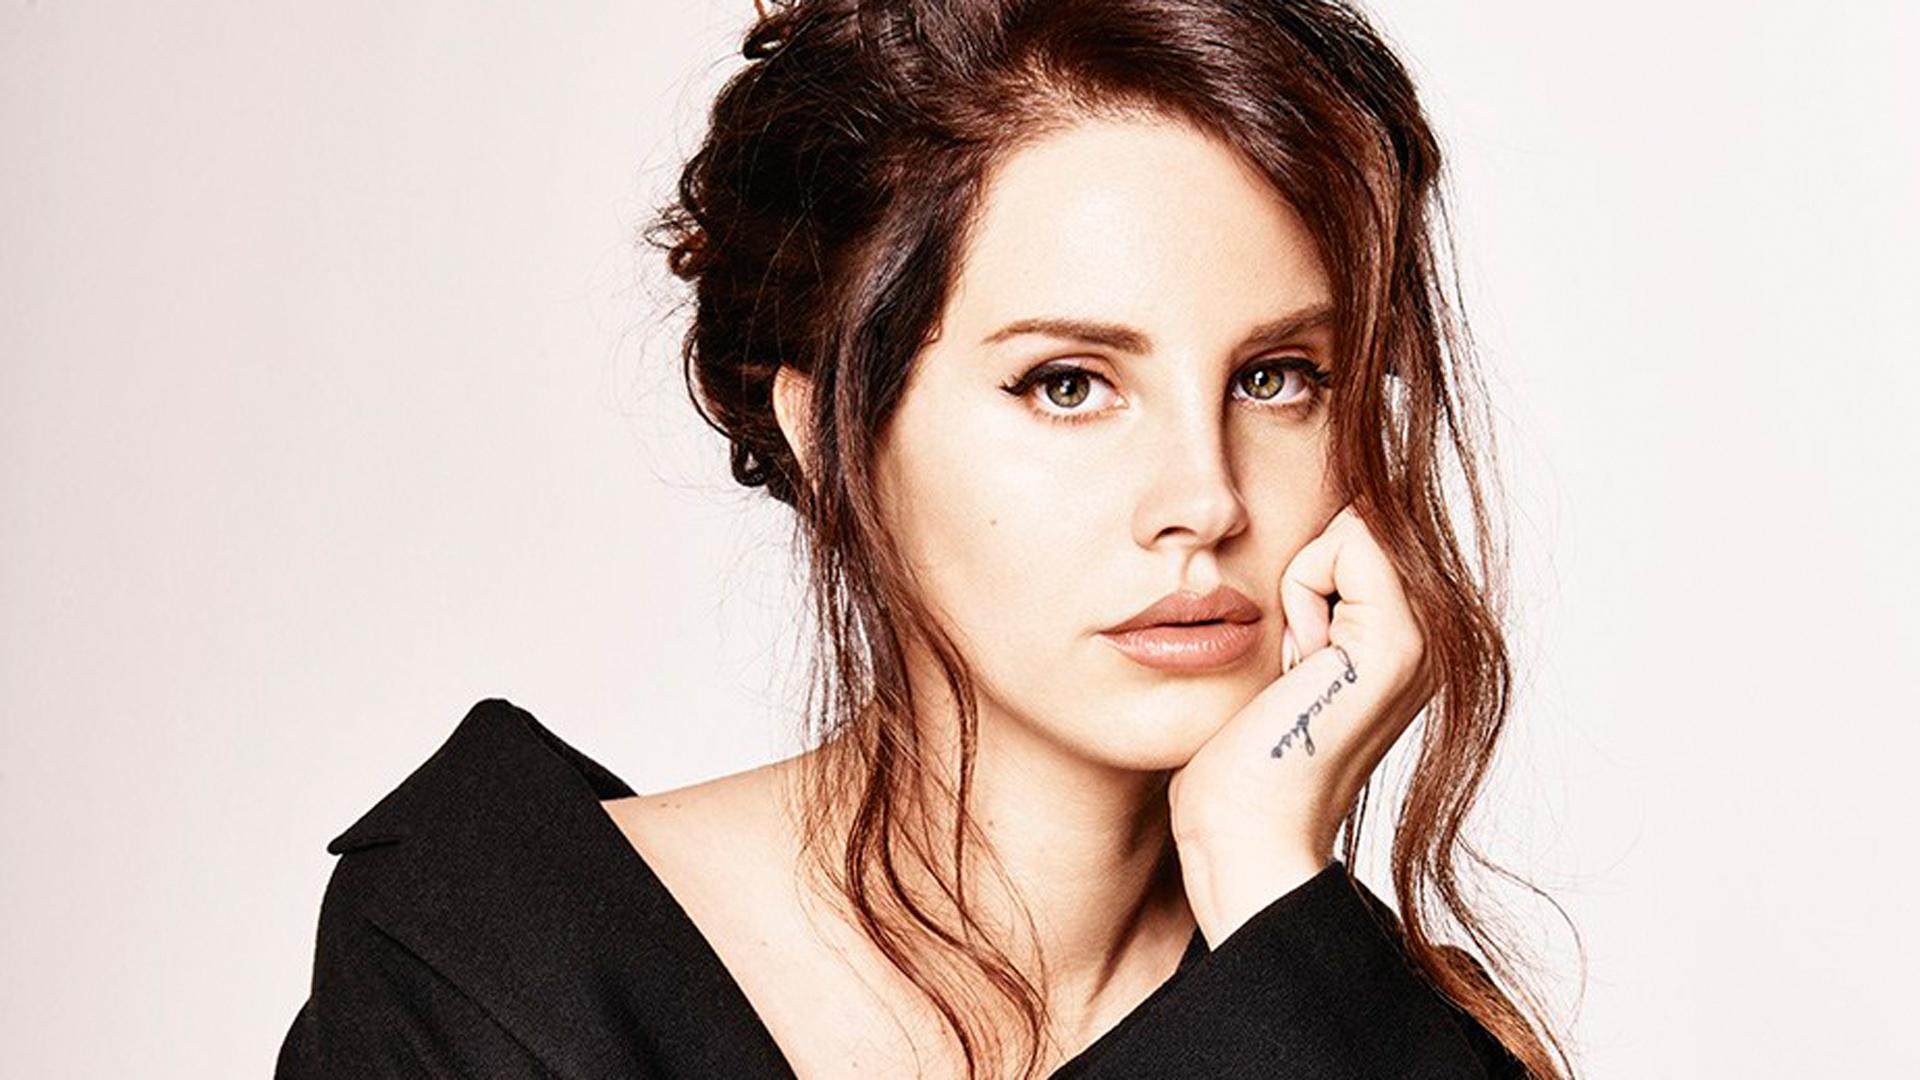 Free download HD Lana Del Rey Wallpapers ...